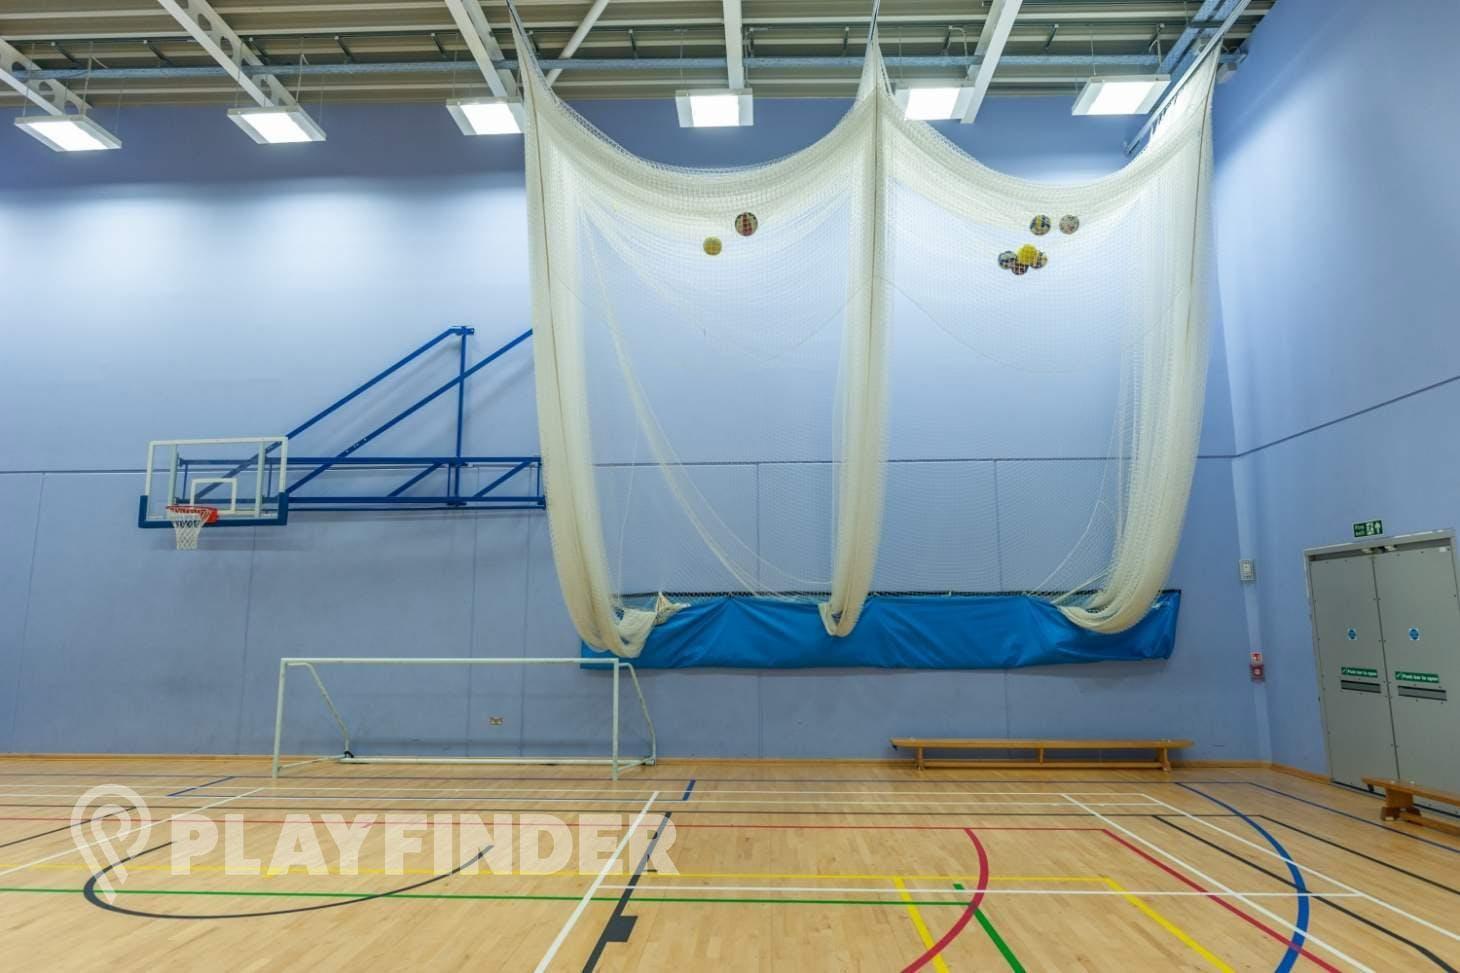 Oasis Academy MediaCityUK Nets | Sports hall cricket facilities